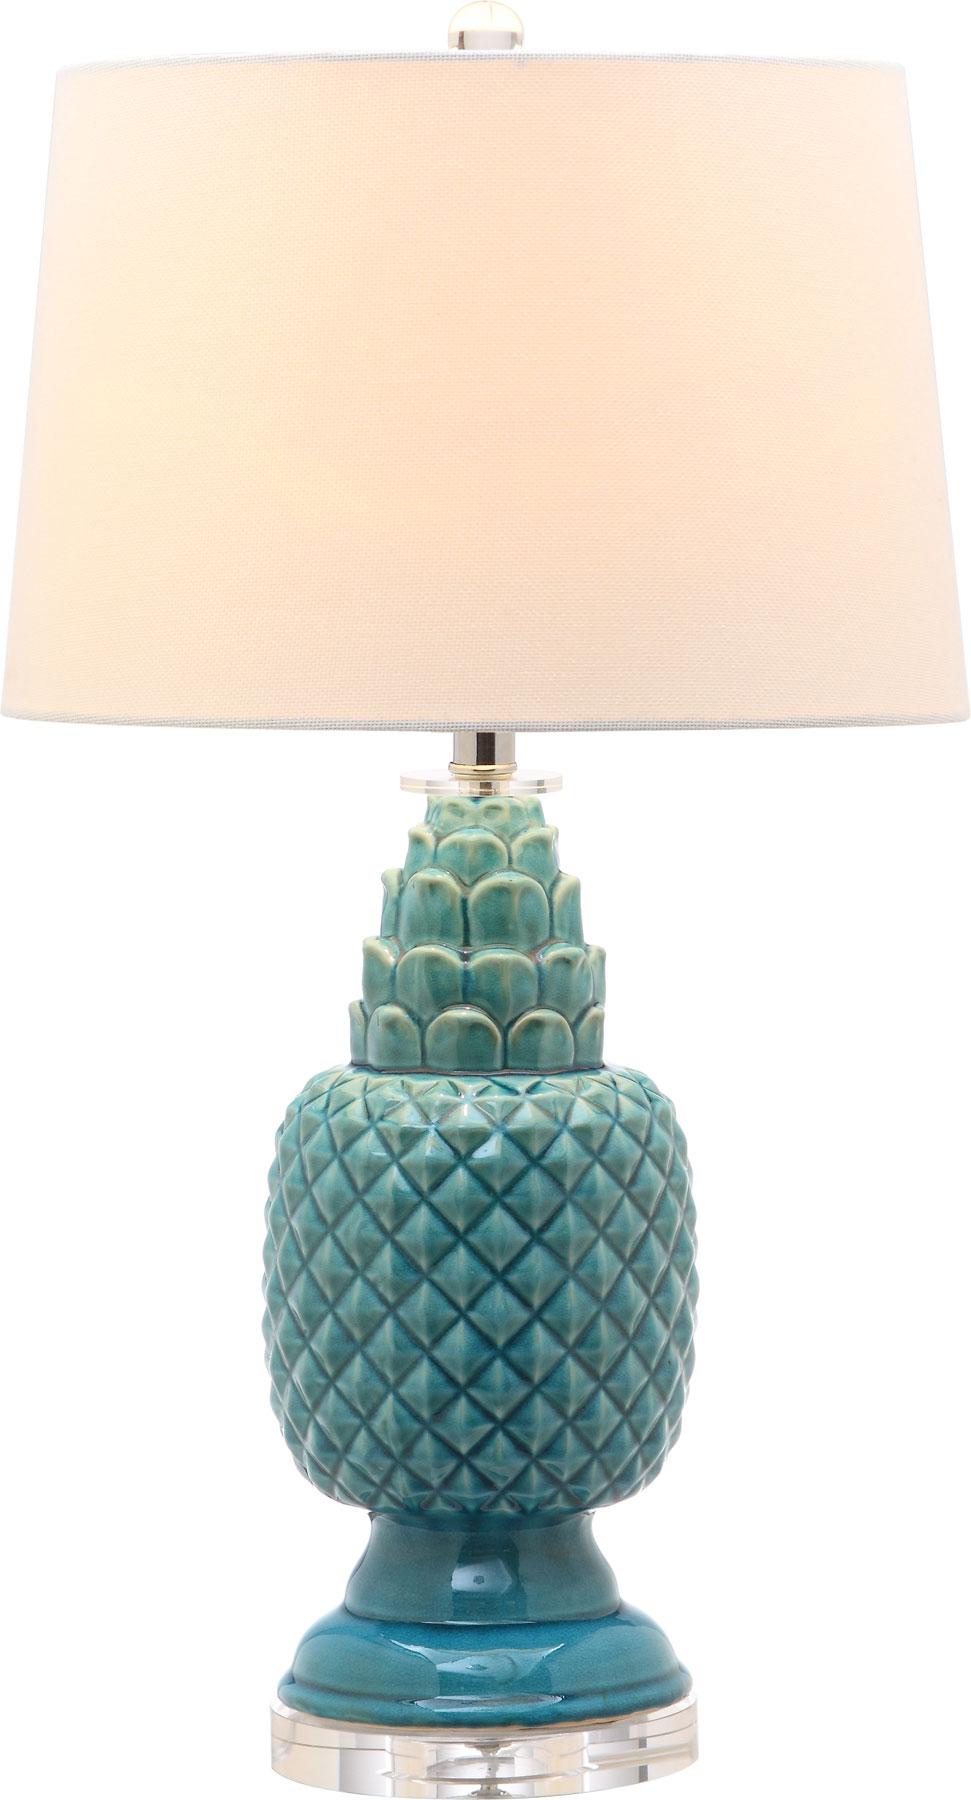 Lit4246b Set2 Table Lamps Lighting By Safavieh